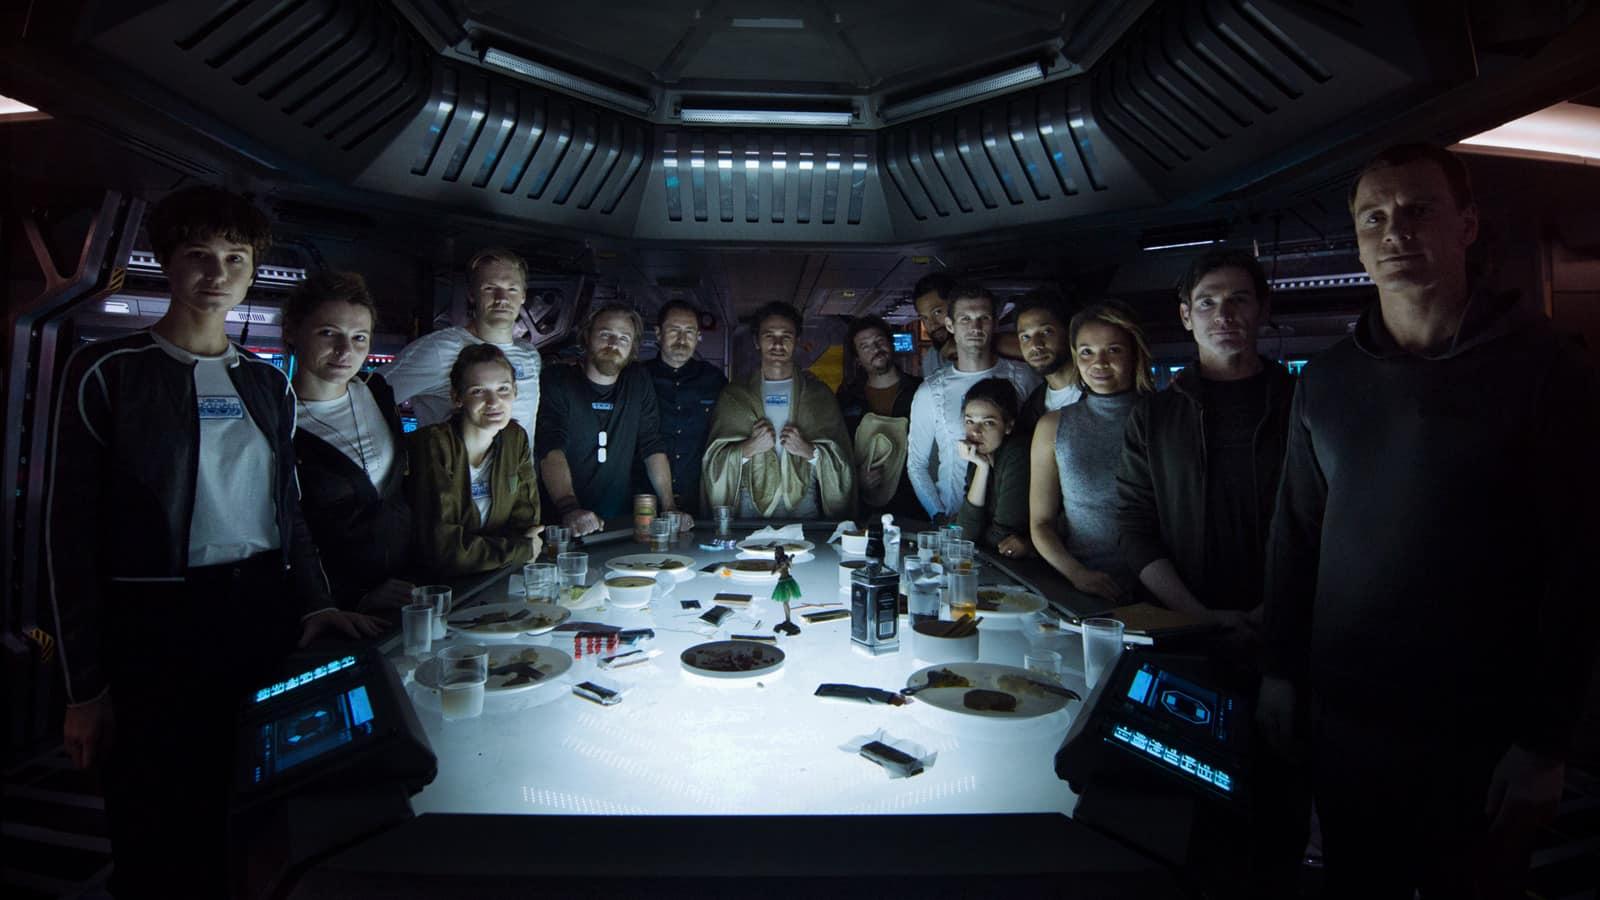 Alien Kino